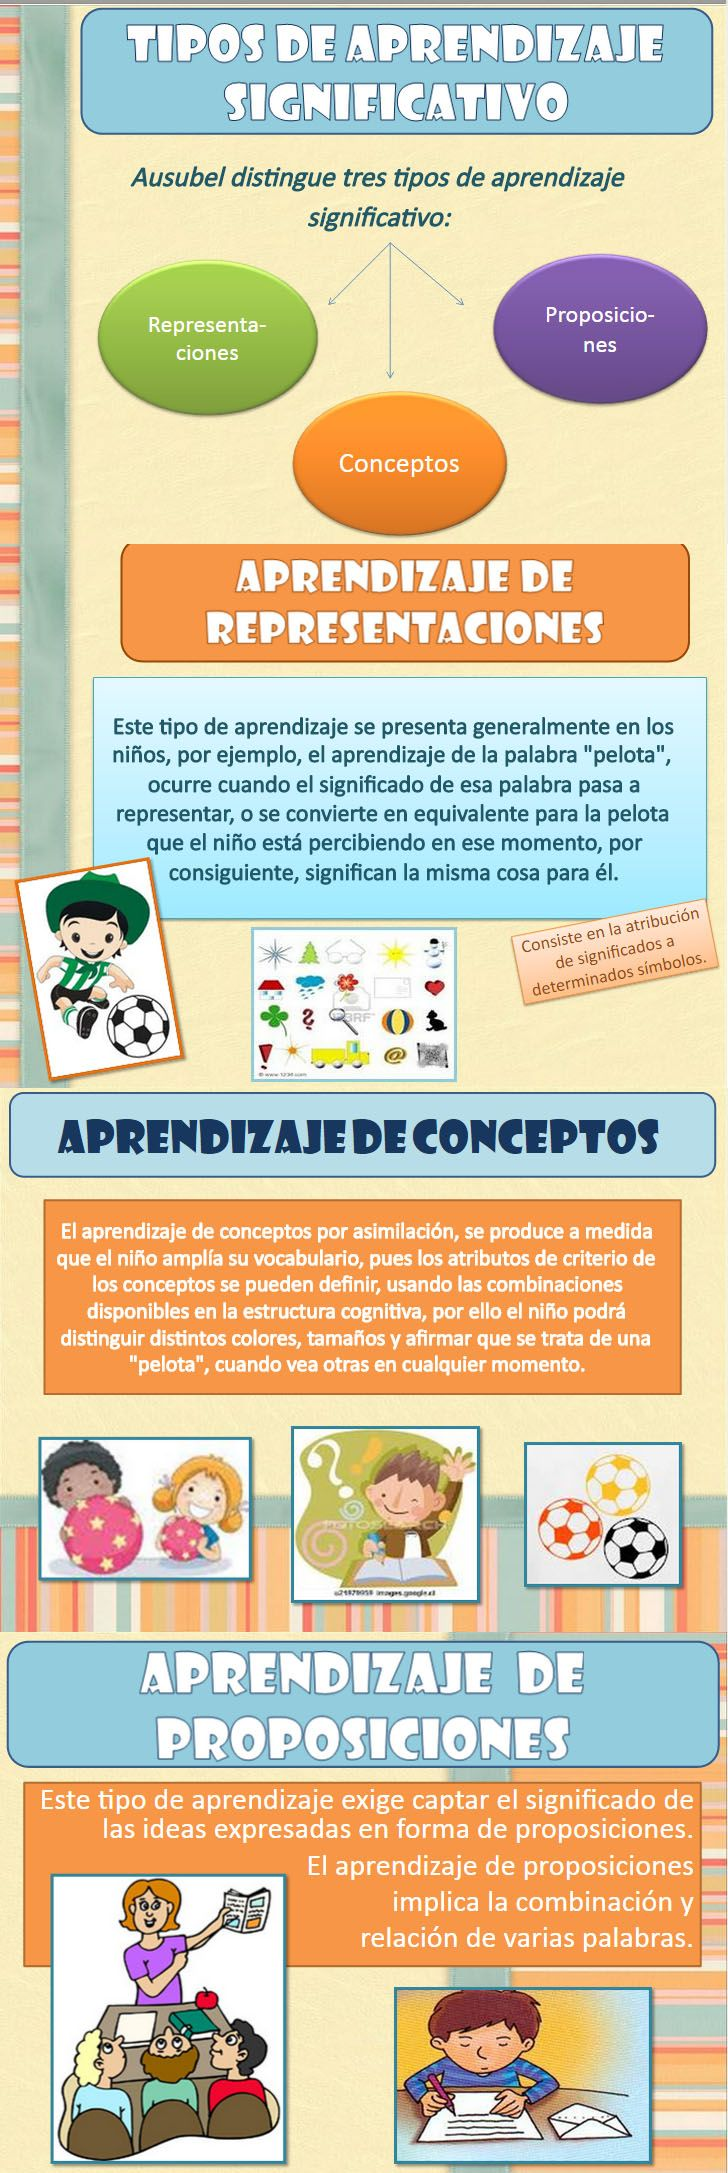 --- Tipos de aprendizaje significativo. http://victoryflo.blogspot.com.es/2013/06/aprendizaje-significativo-segun-david.html